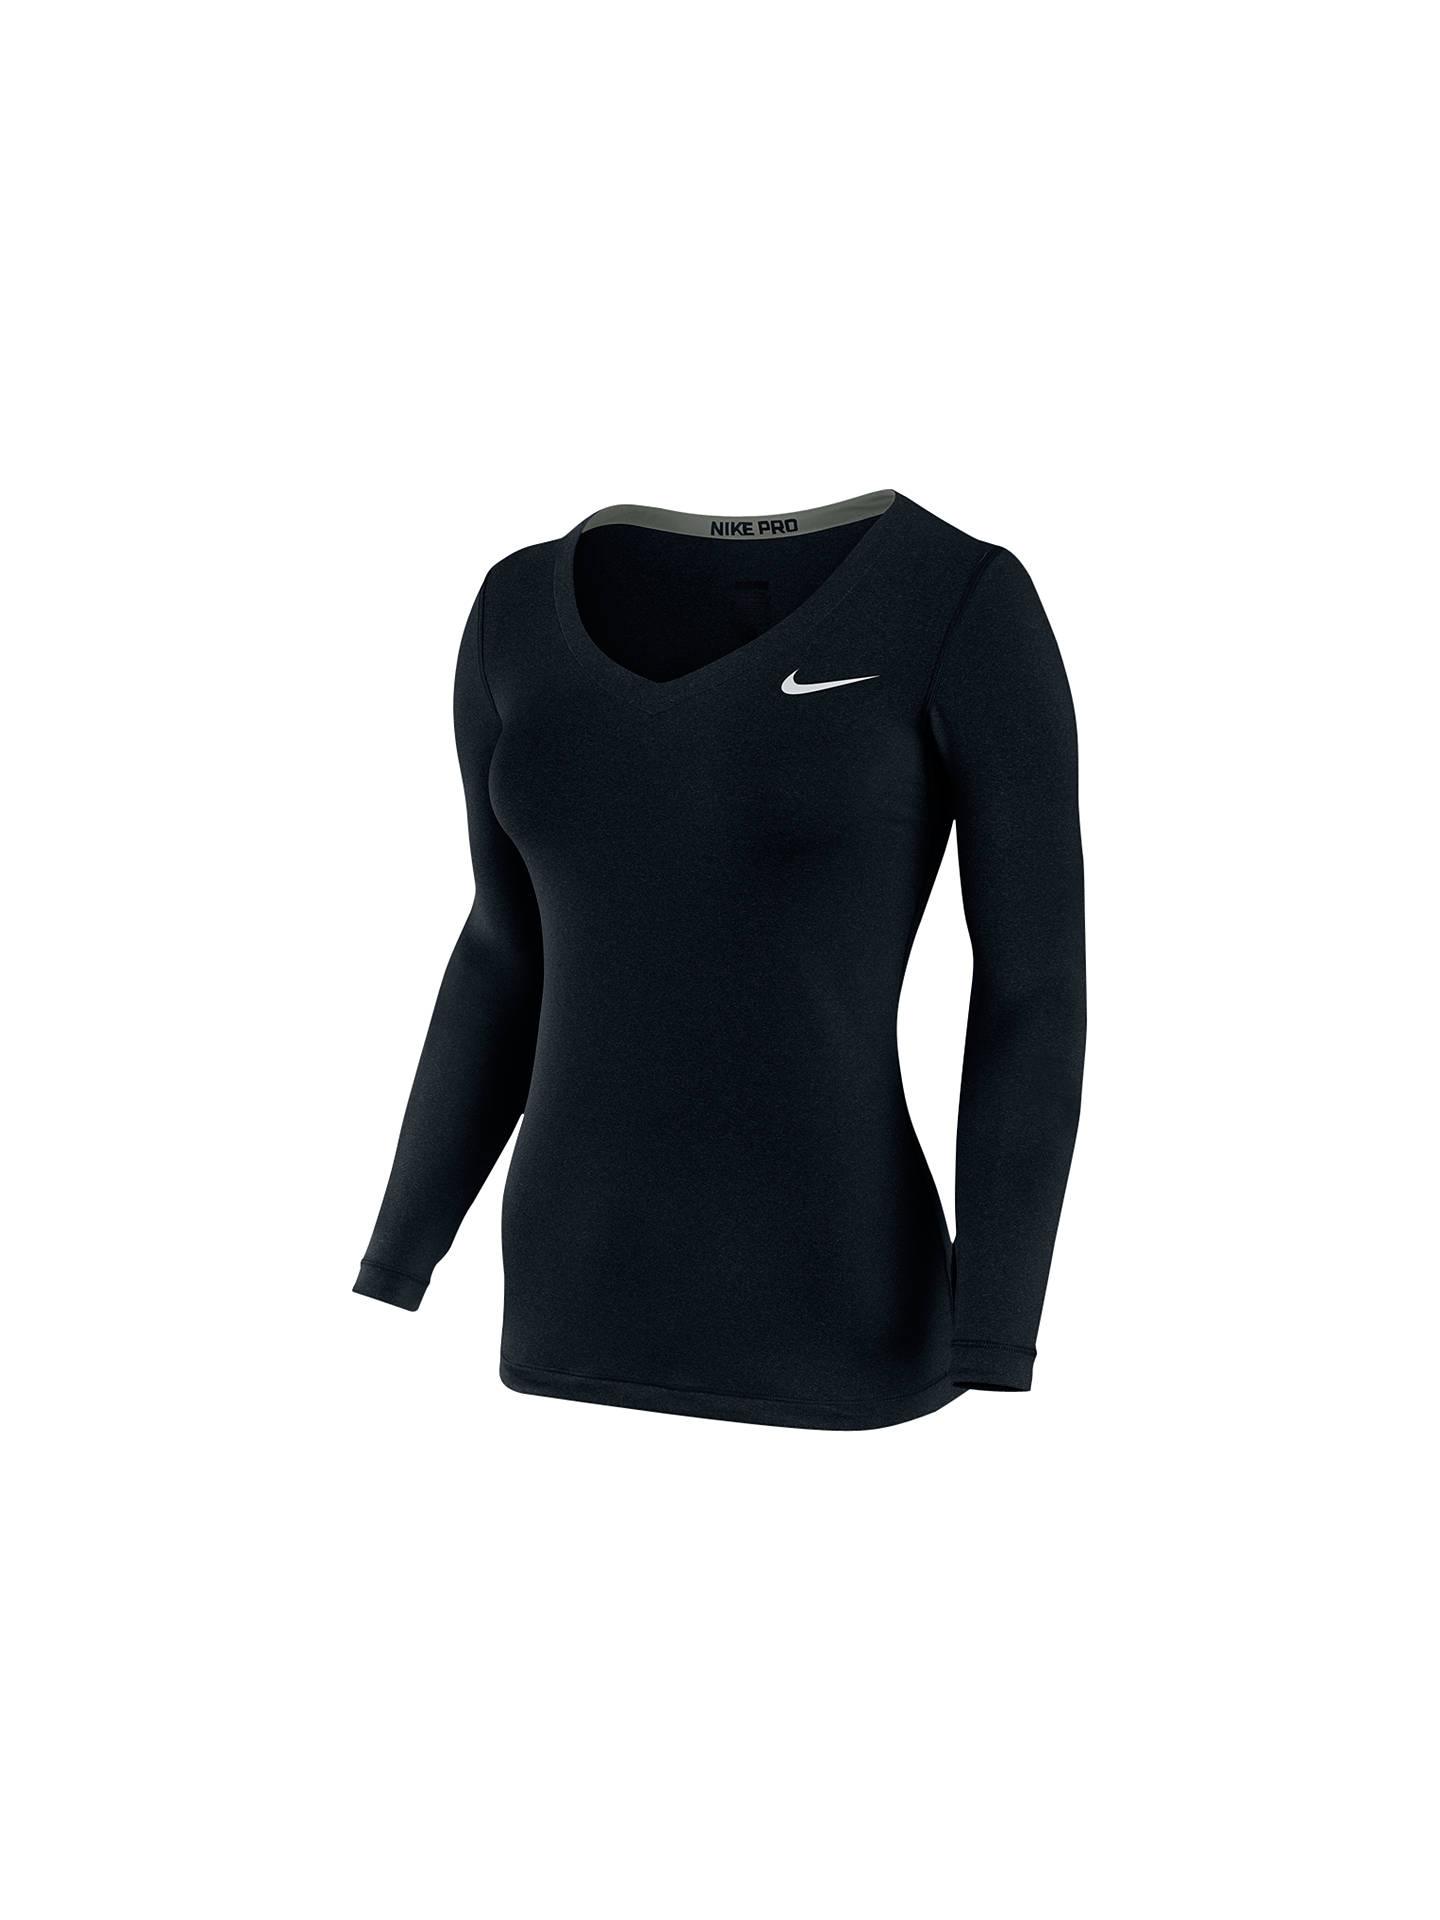 c639bf4b Nike Pro Long Sleeve V-Neck T-Shirt, Black at John Lewis & Partners